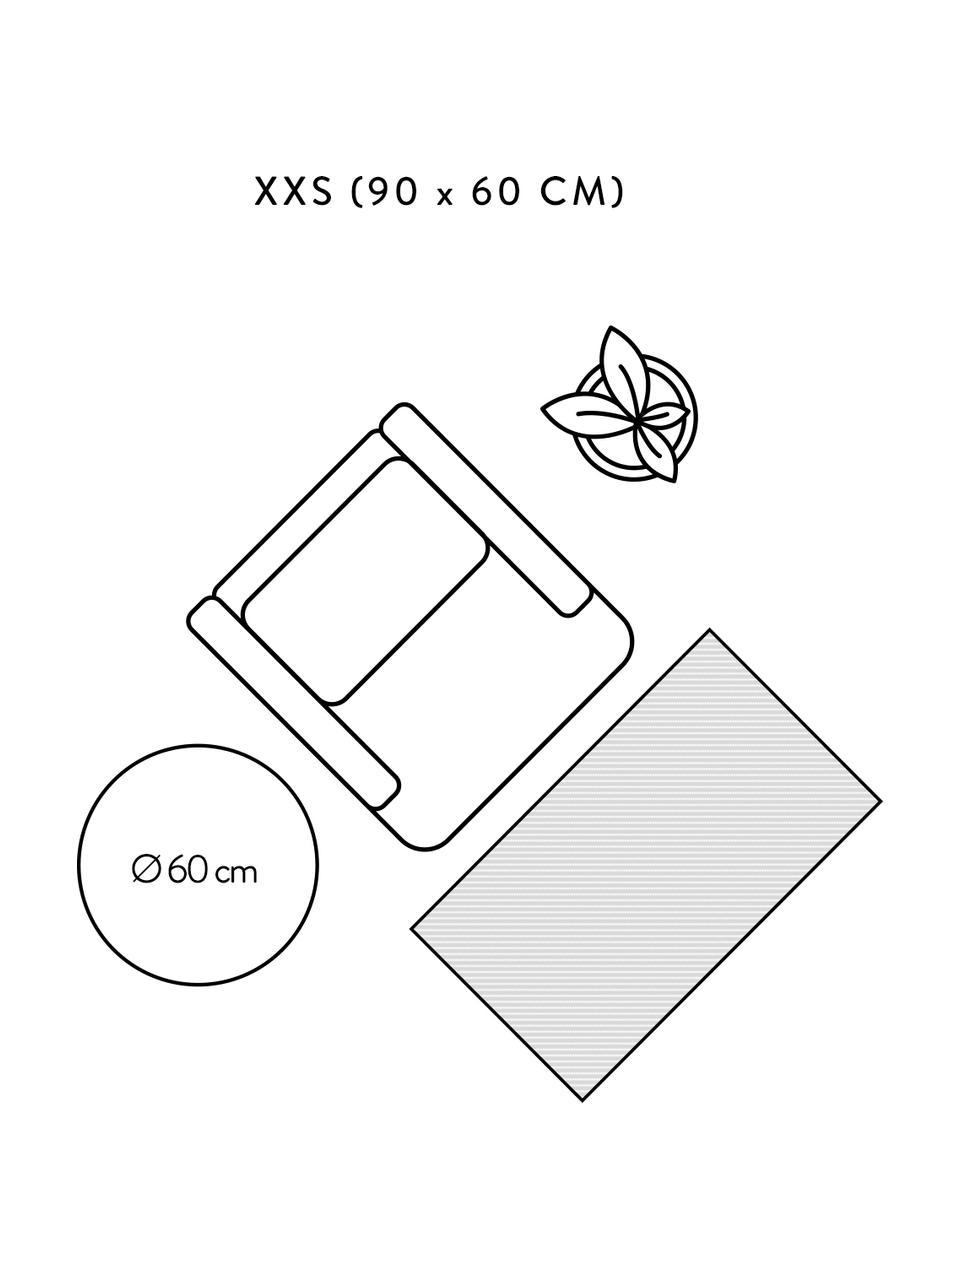 Tappeto in juta fatto a mano Sharmila, 100% juta, Beige, Larg. 60 x Lung. 90 cm (taglia XXS)